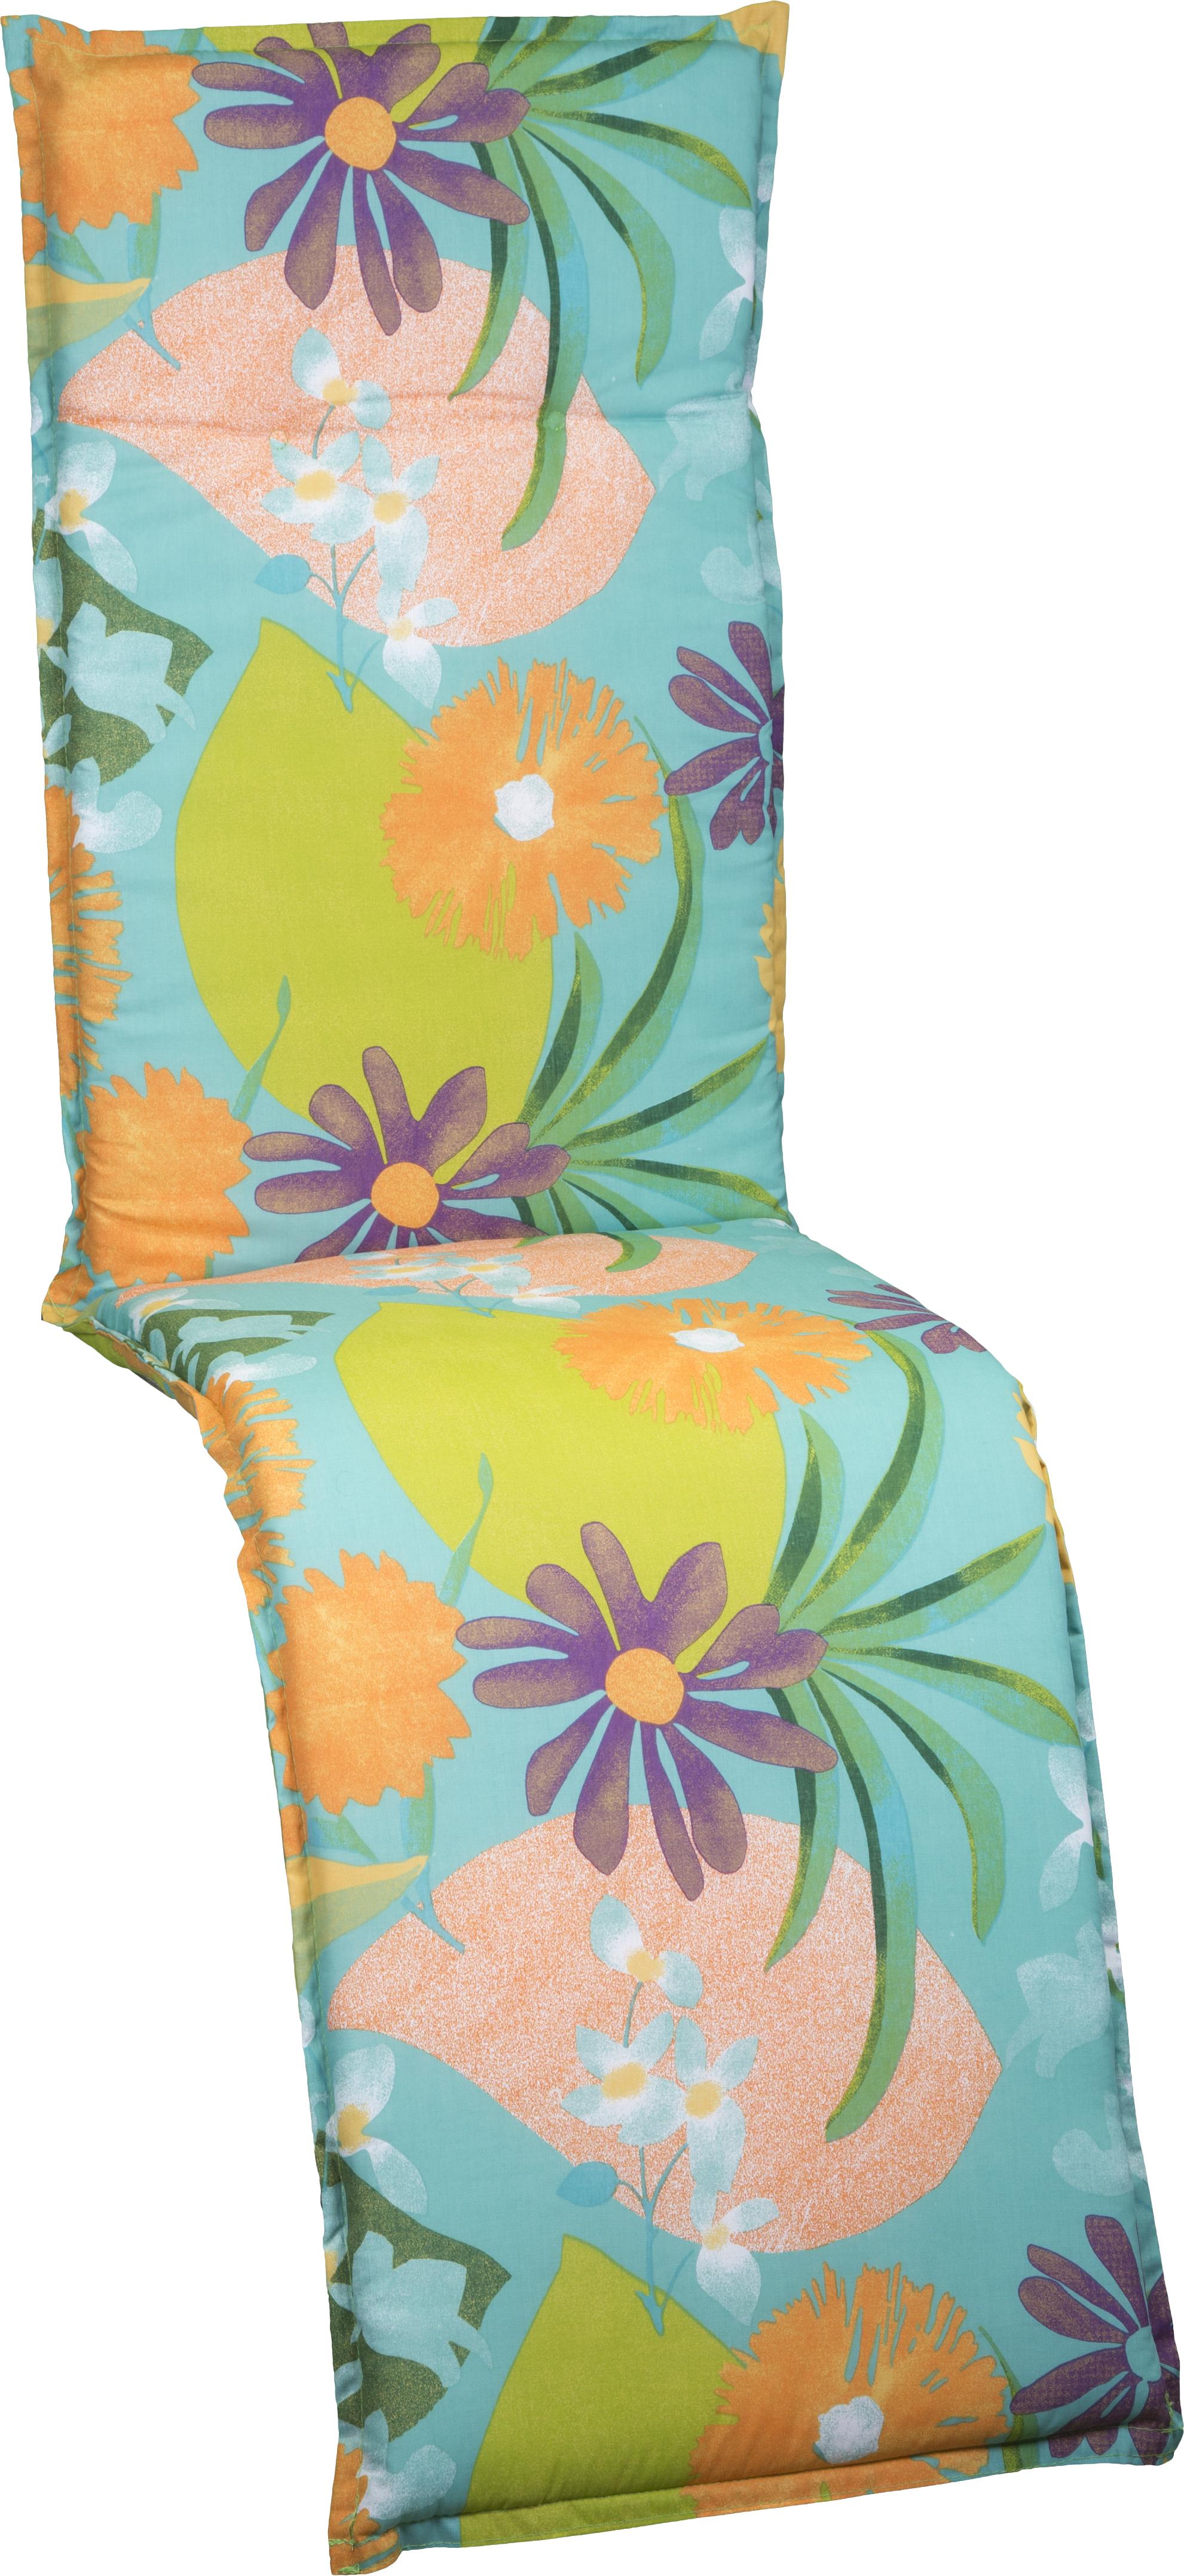 Aquarell Blumenmotiv Relaxstuhl Polster Design M701 orange, türkis, rosé und grün